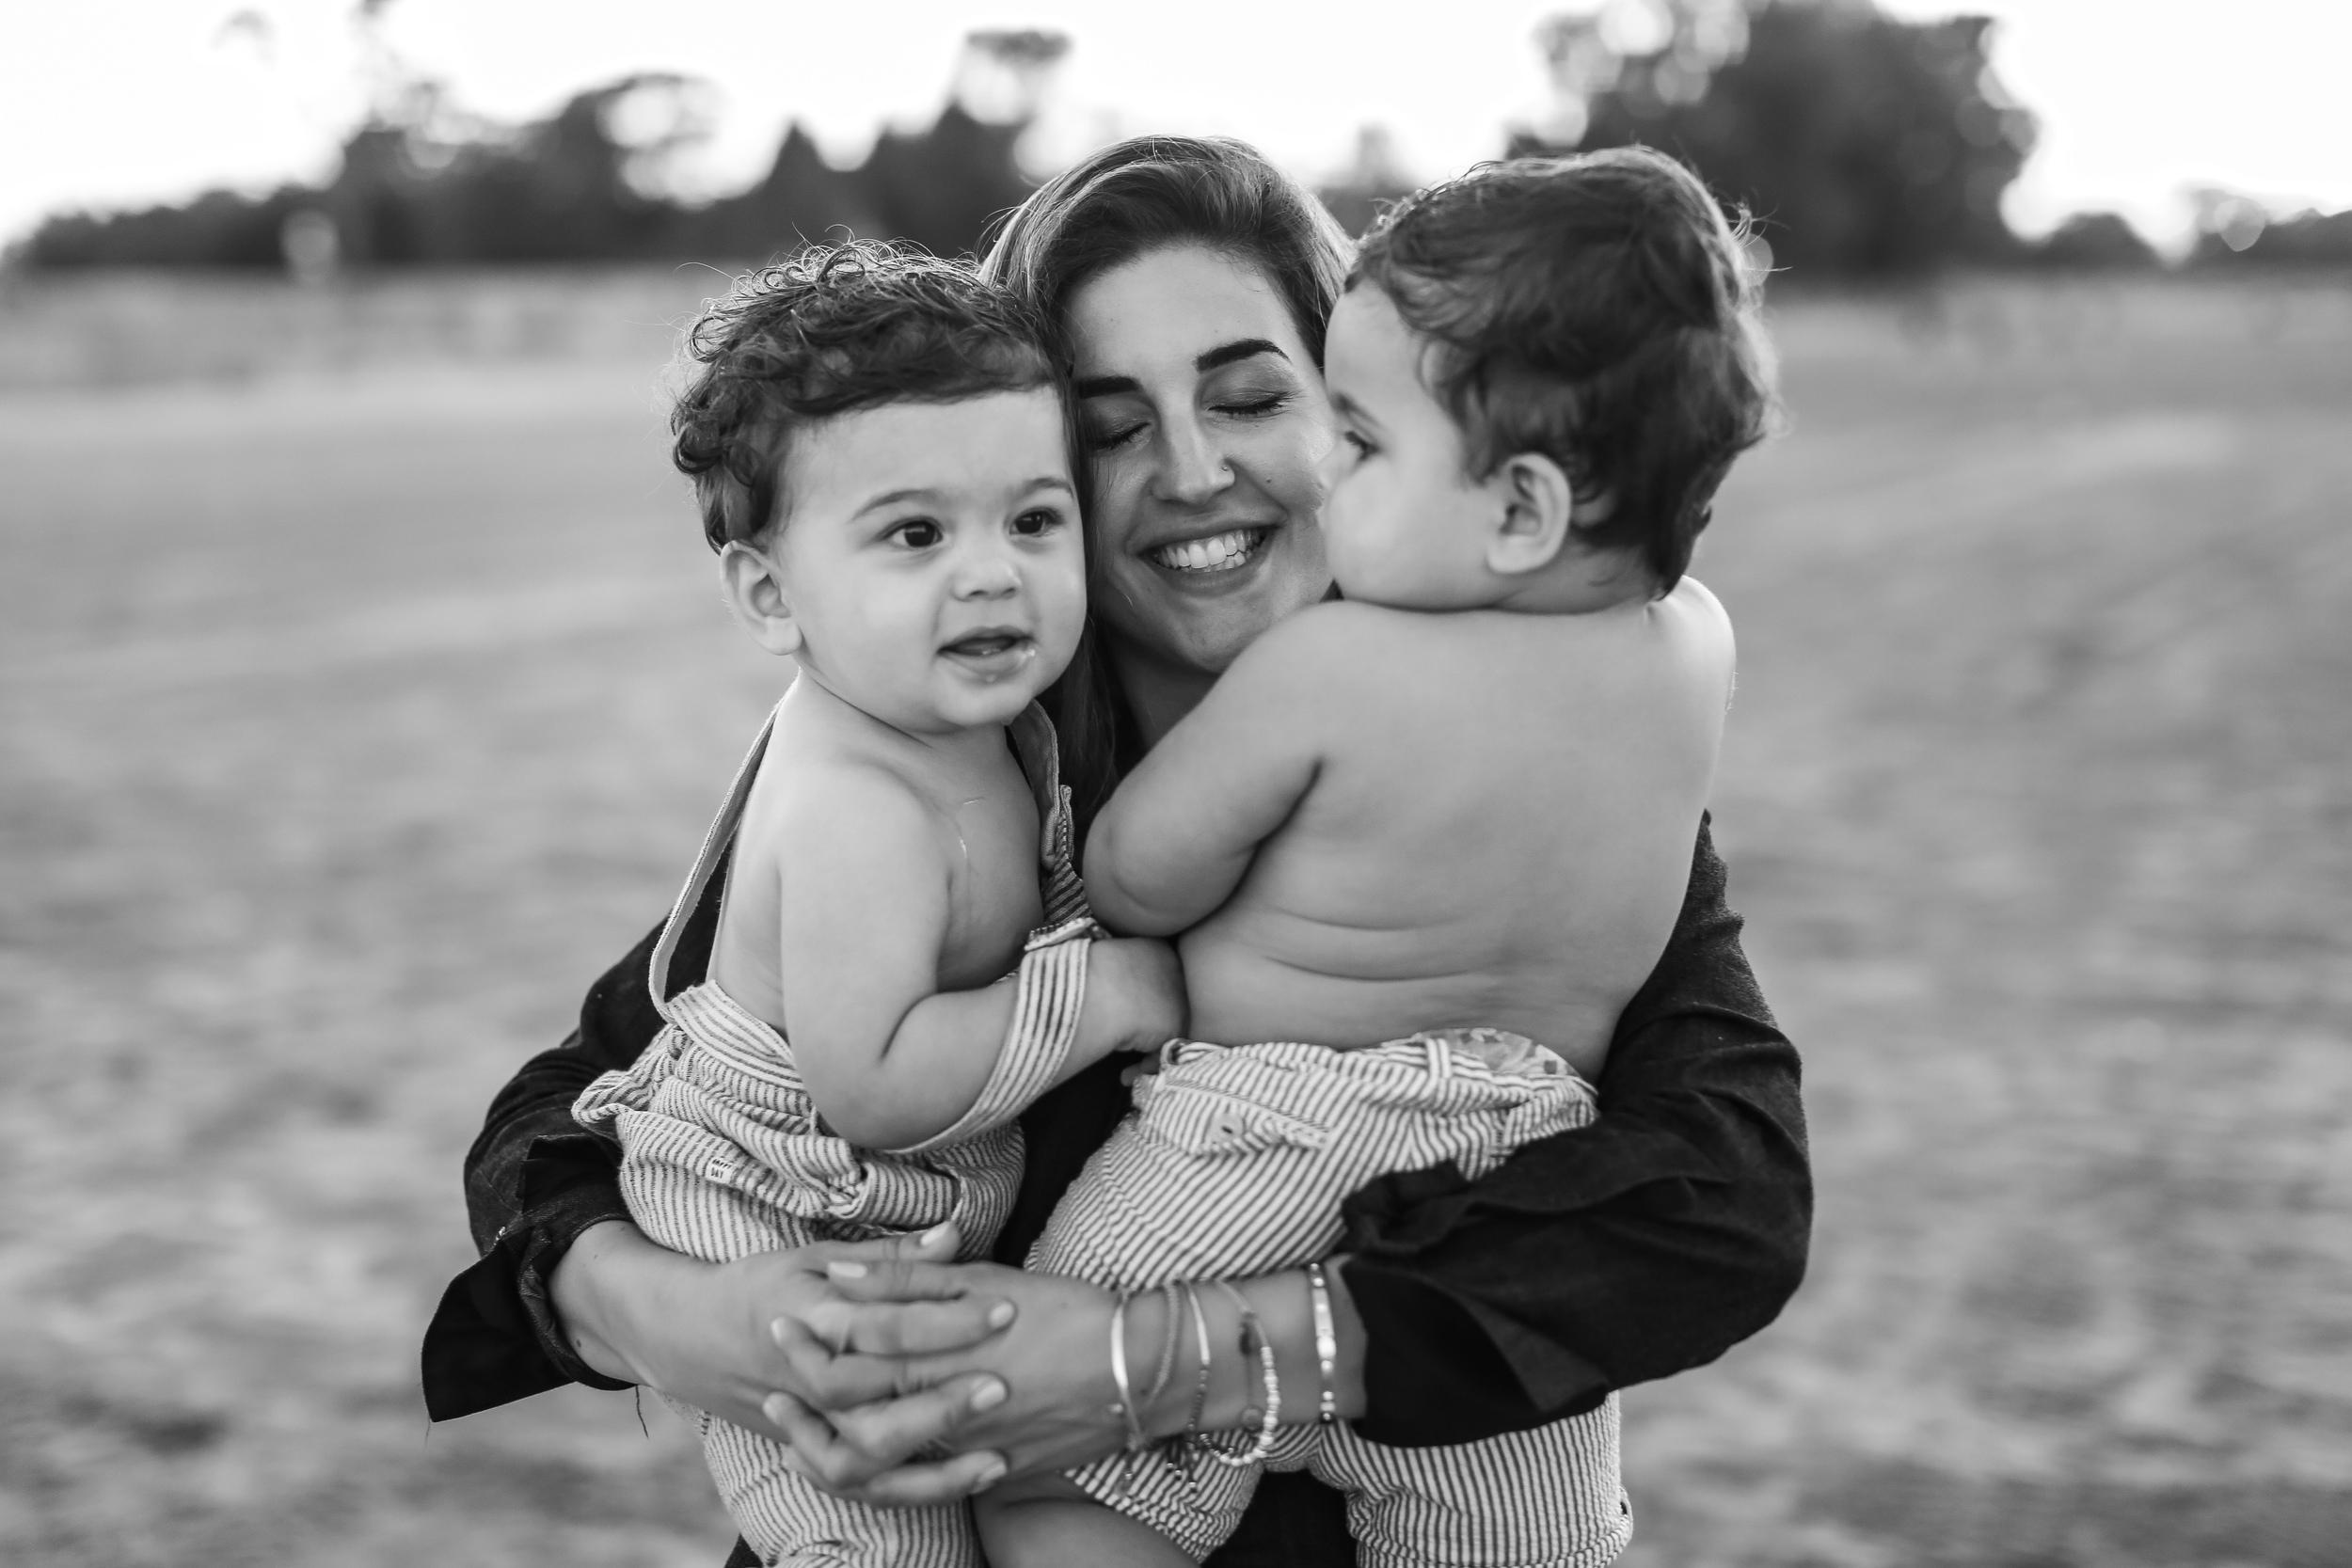 jenny-grimm-chicago-family-lifestyle-photographer